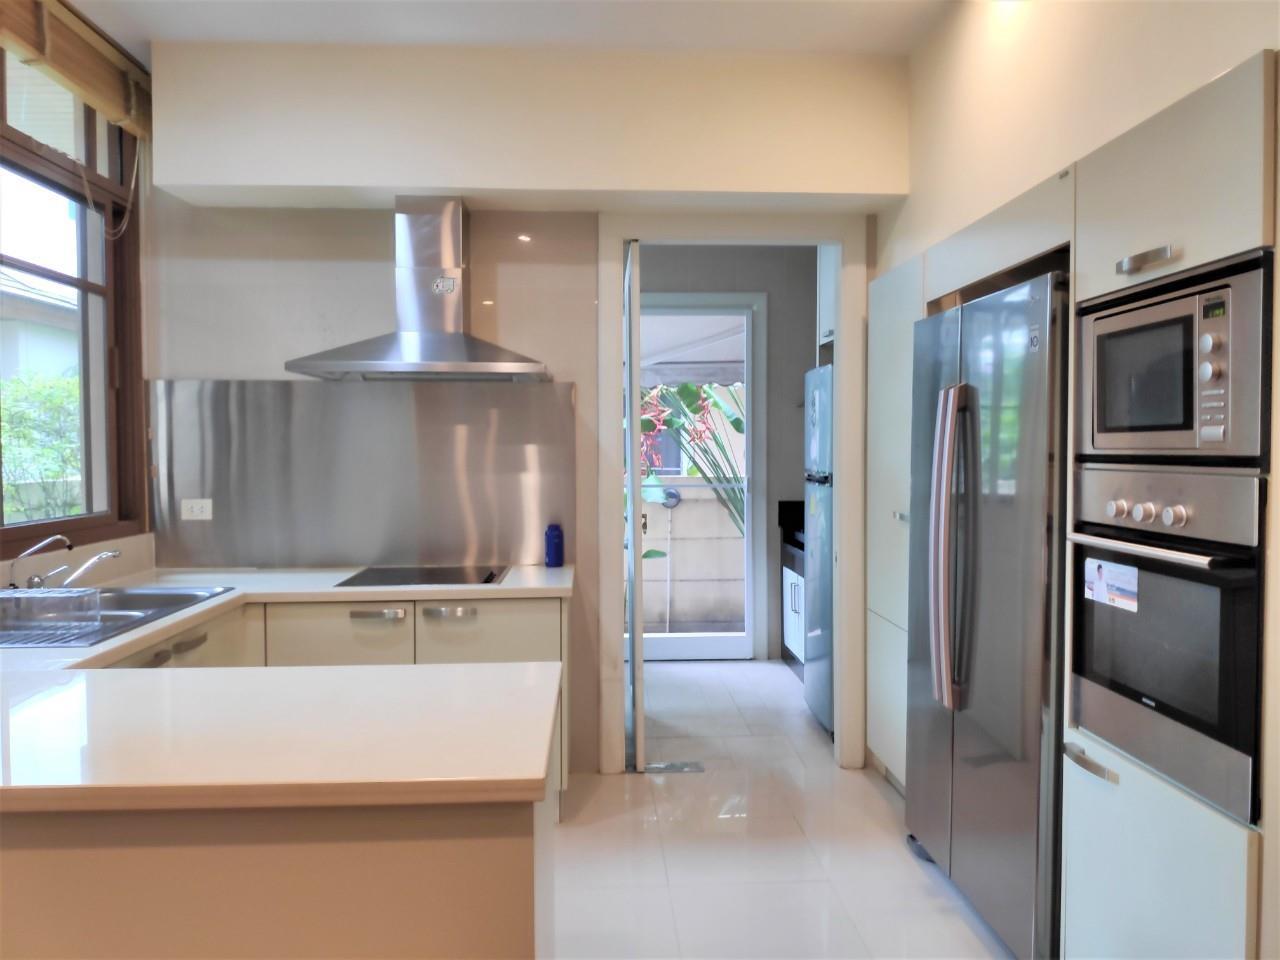 Agent - Natchga Boonkrong  Agency's For Rent House 4 Bedrooms Baan Sansiri Sukhumvit 67 19